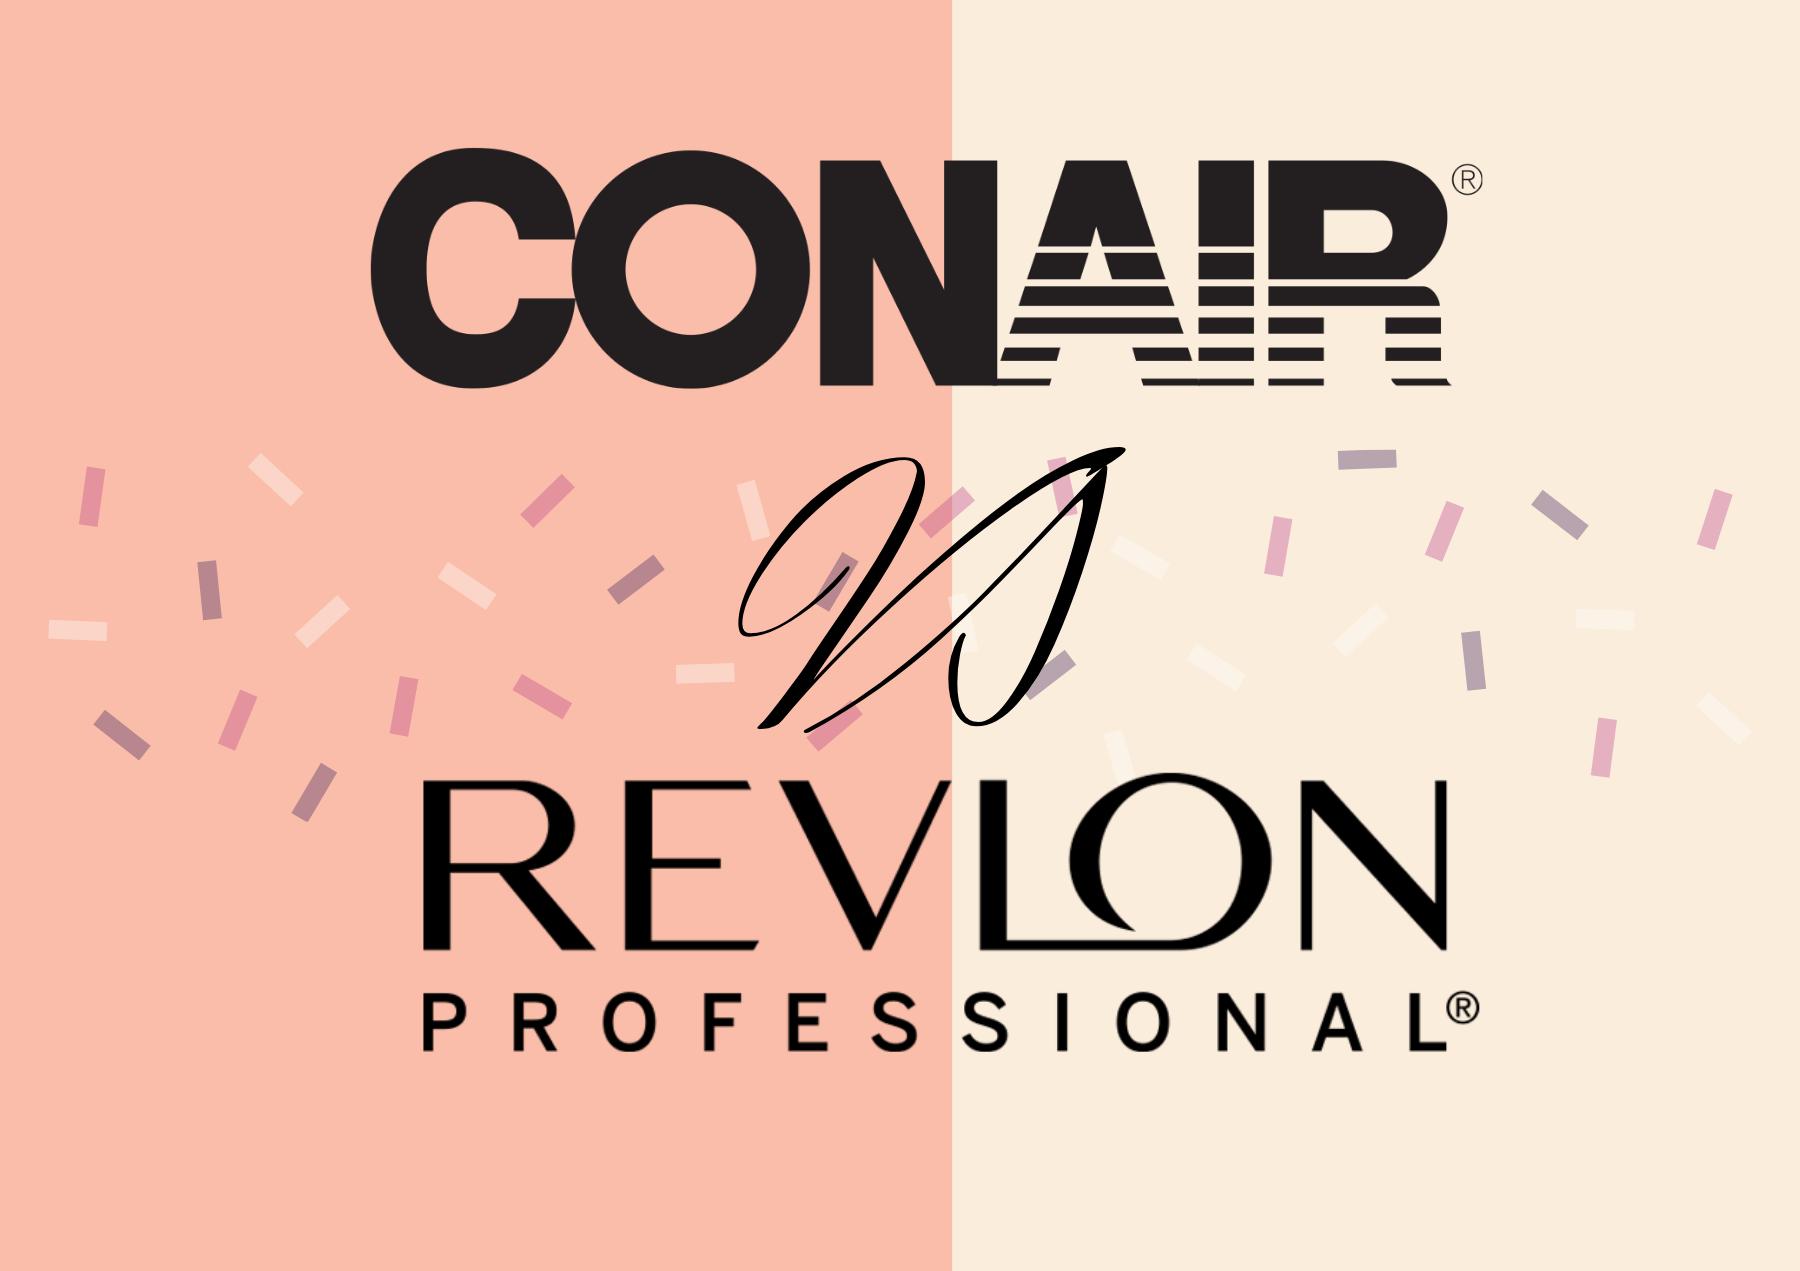 conair vs revlon air brushes